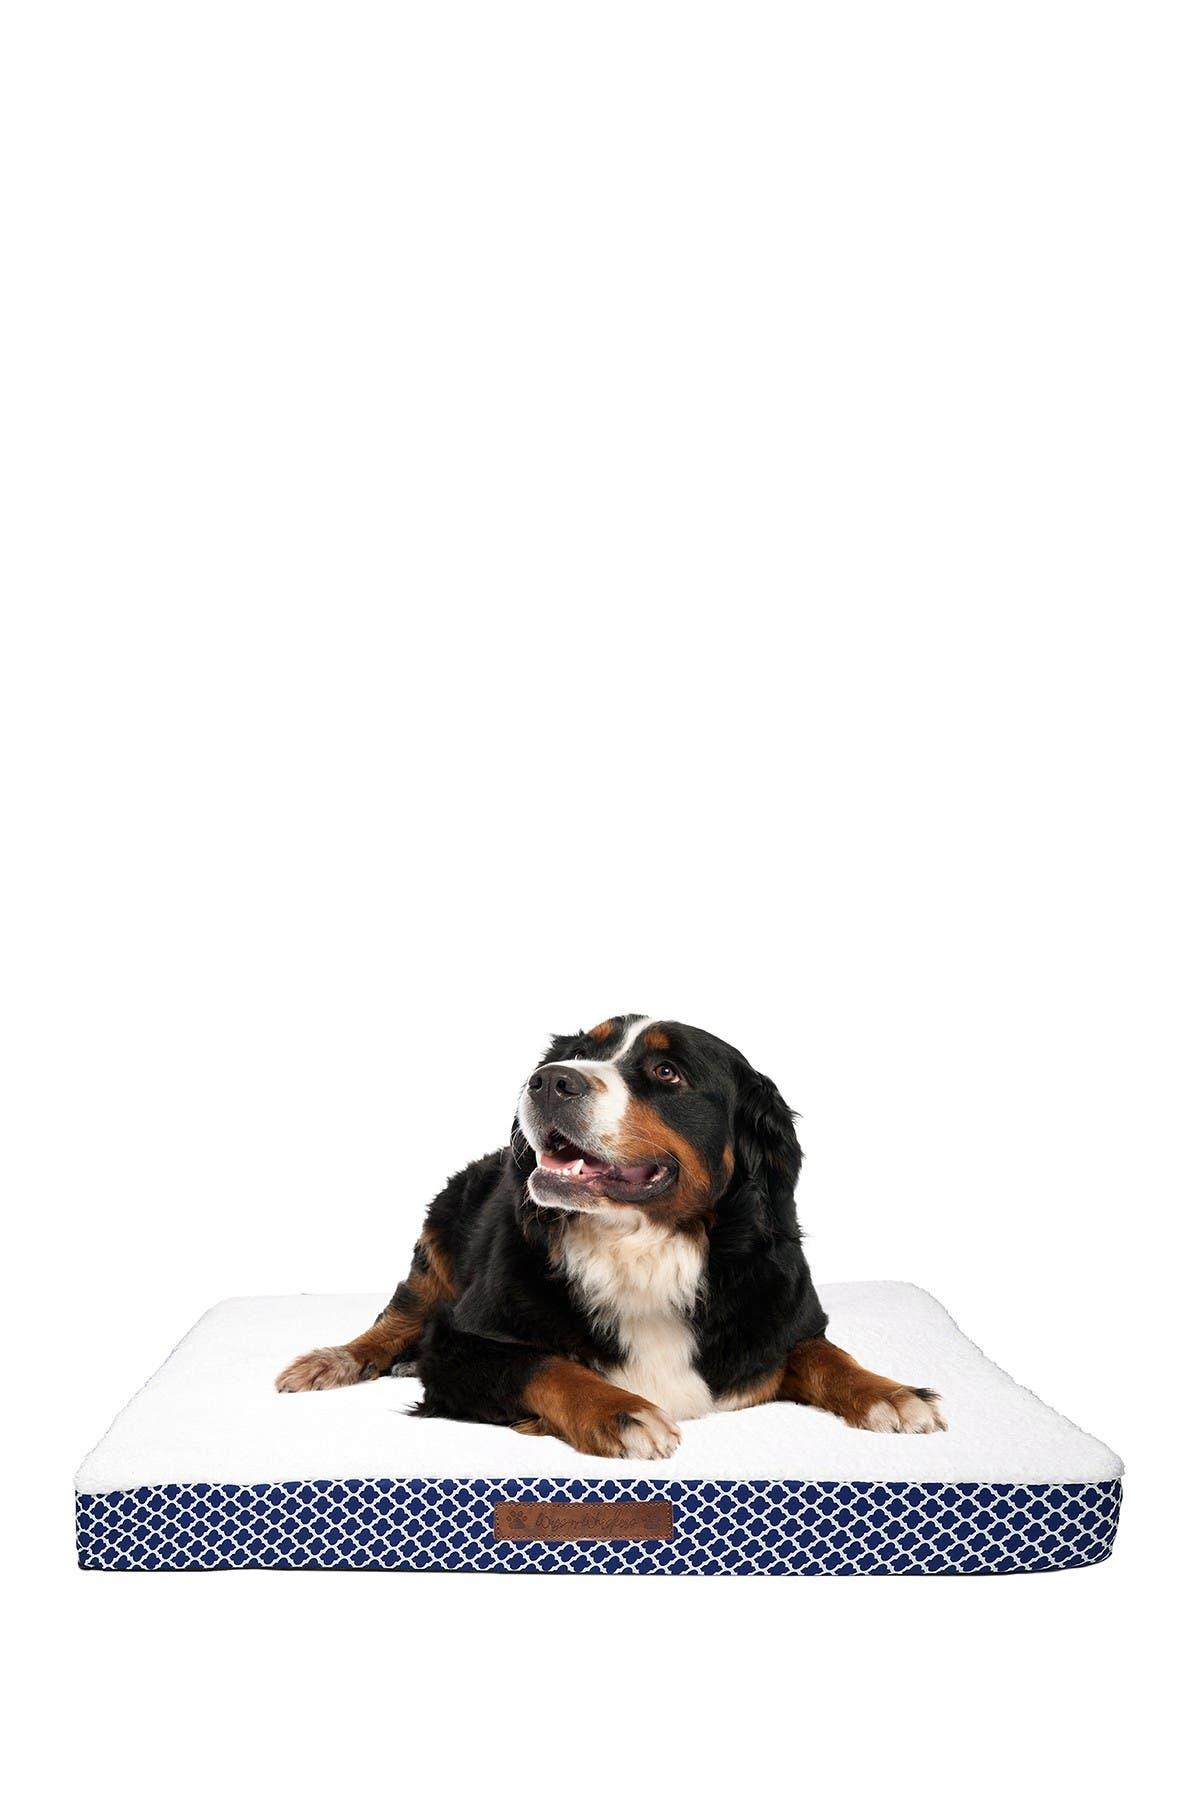 Image of Duck River Textile Cezebel Trellis Large Orthopedic Memory Foam Pet Bed